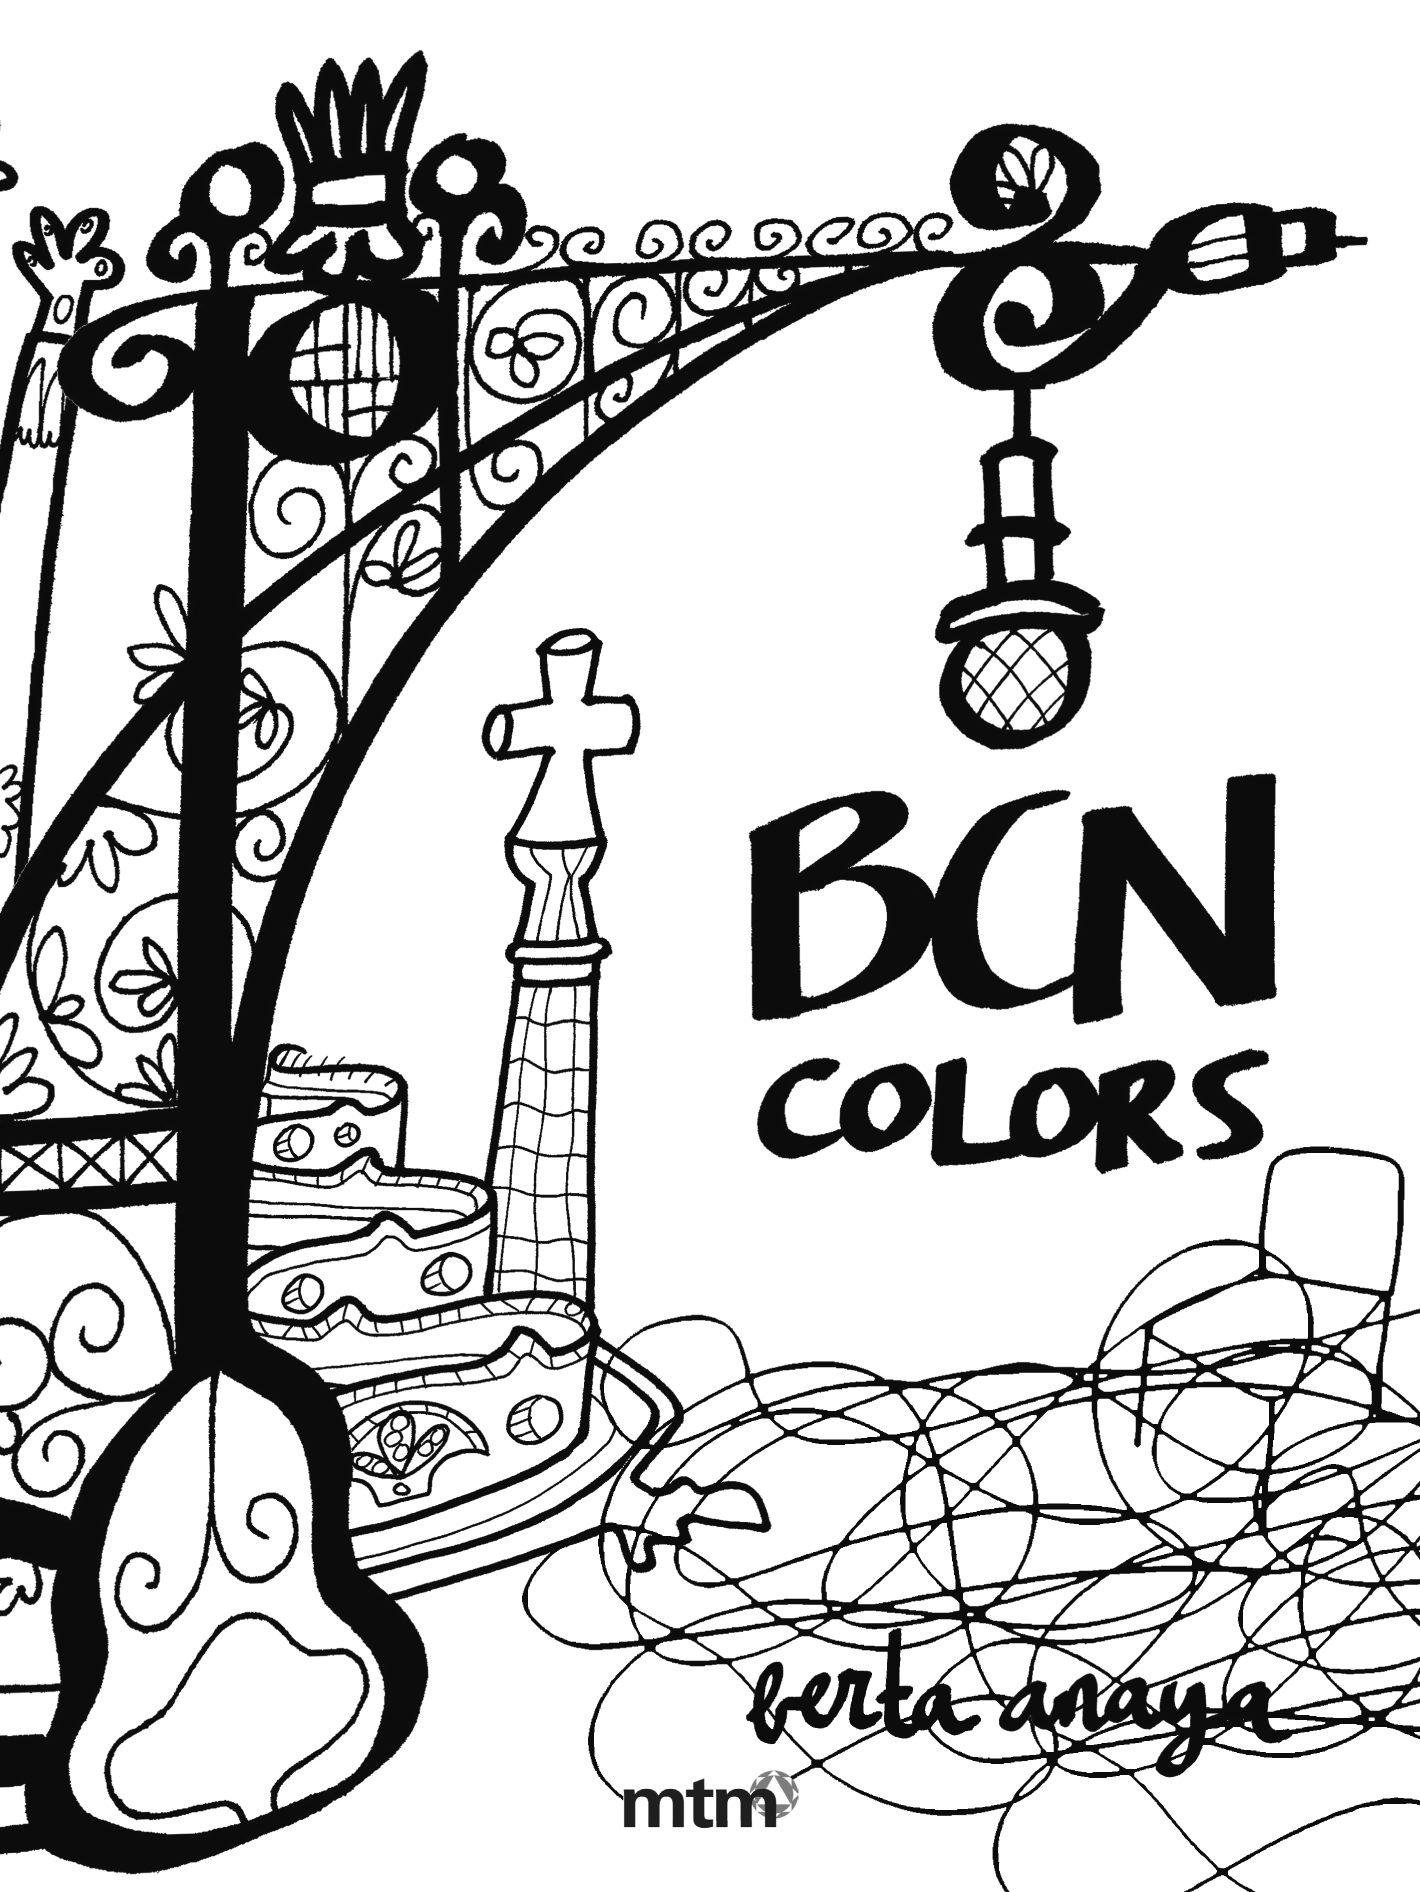 BCN COLORS | BERTA ANAYA | Comprar libro 9788415278436